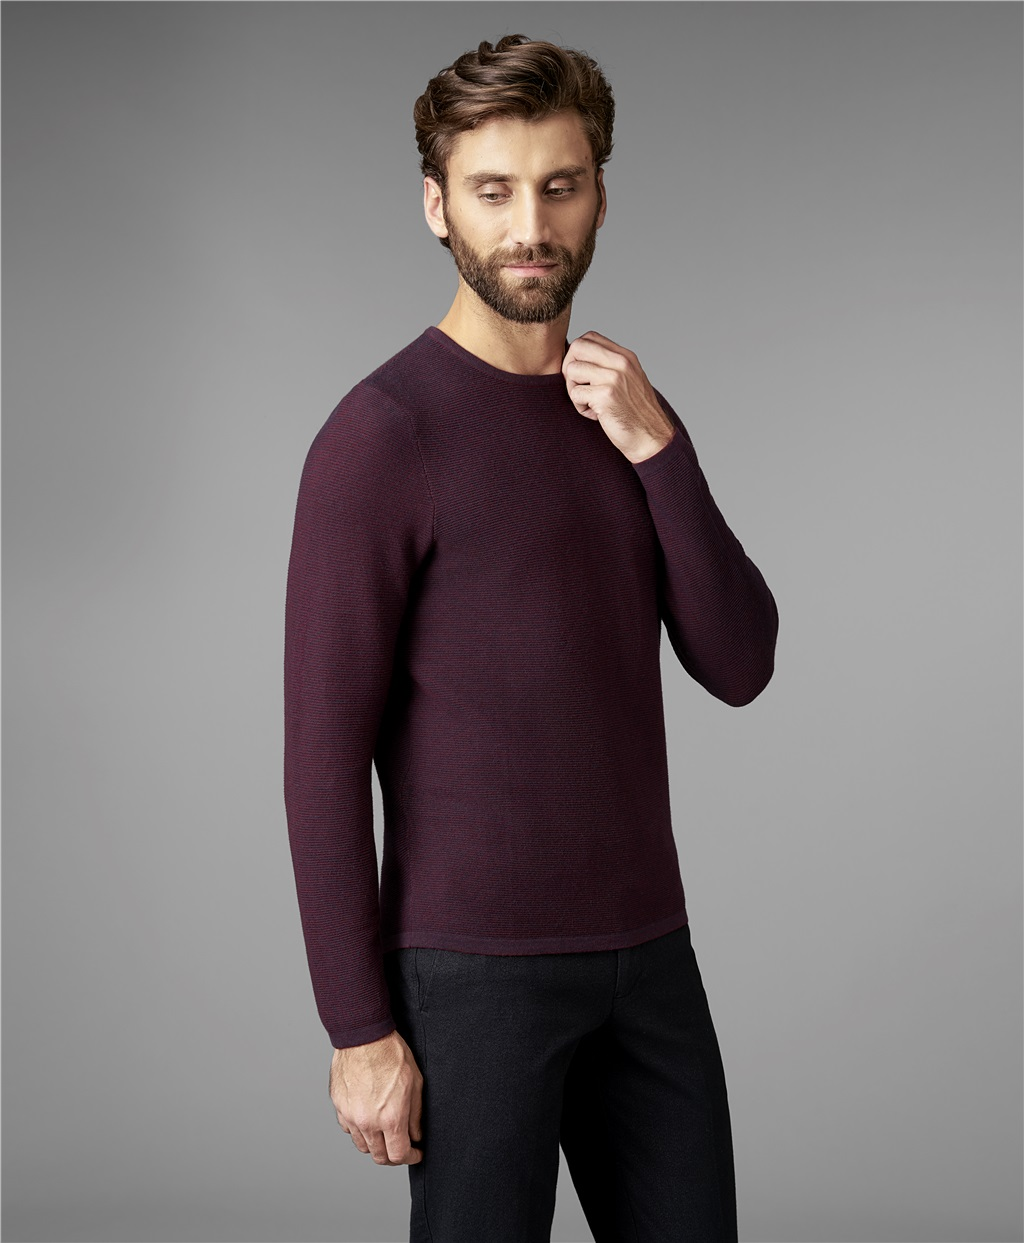 Пуловер мужской HENDERSON KWL-0685 бордовый 46 фото